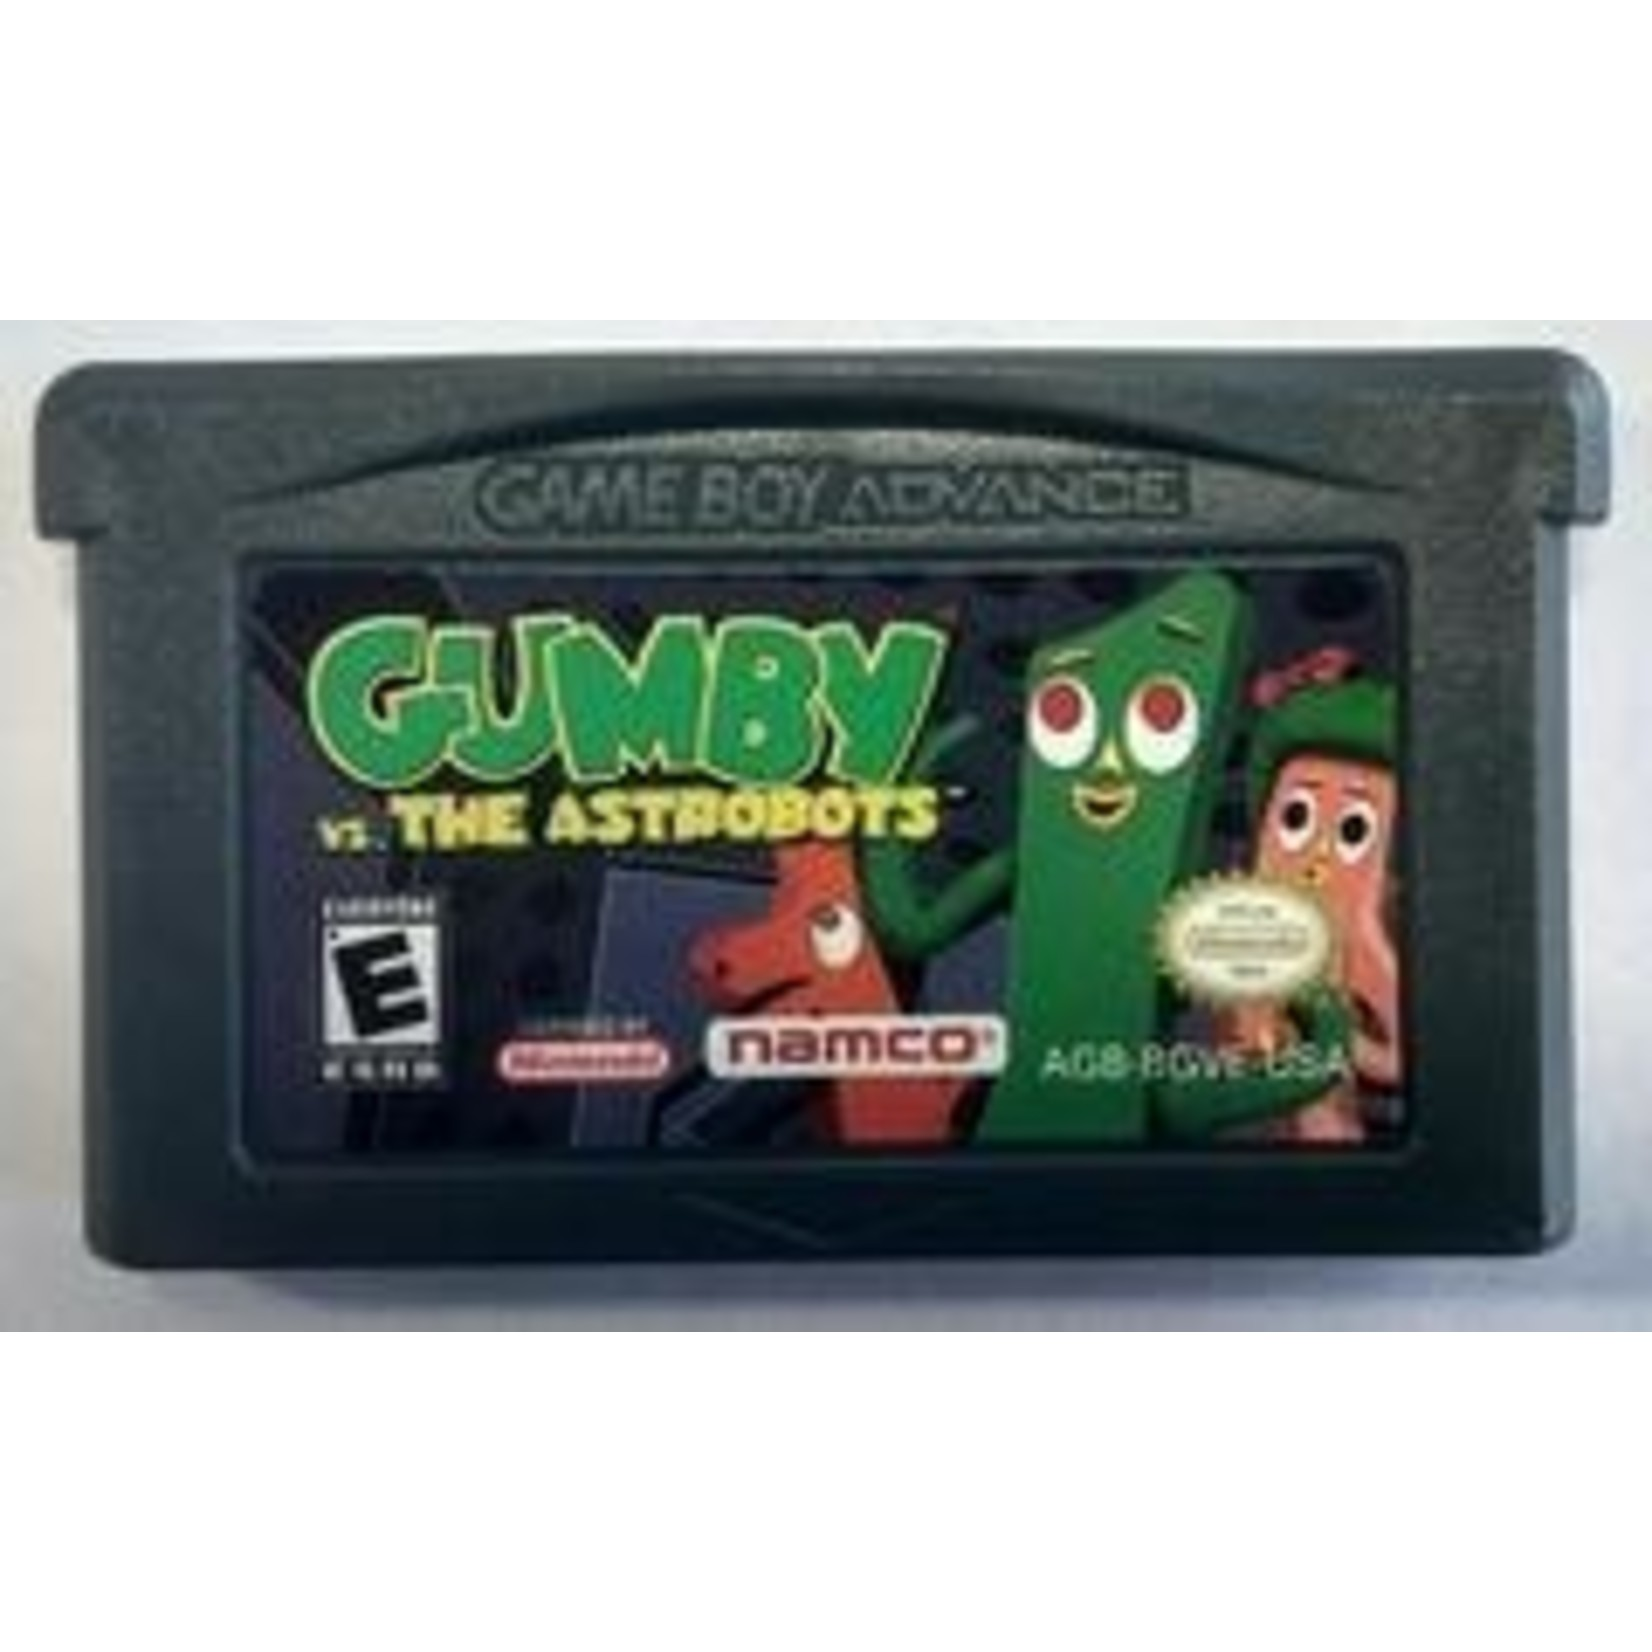 gbau-Gumby vs The Astrobots